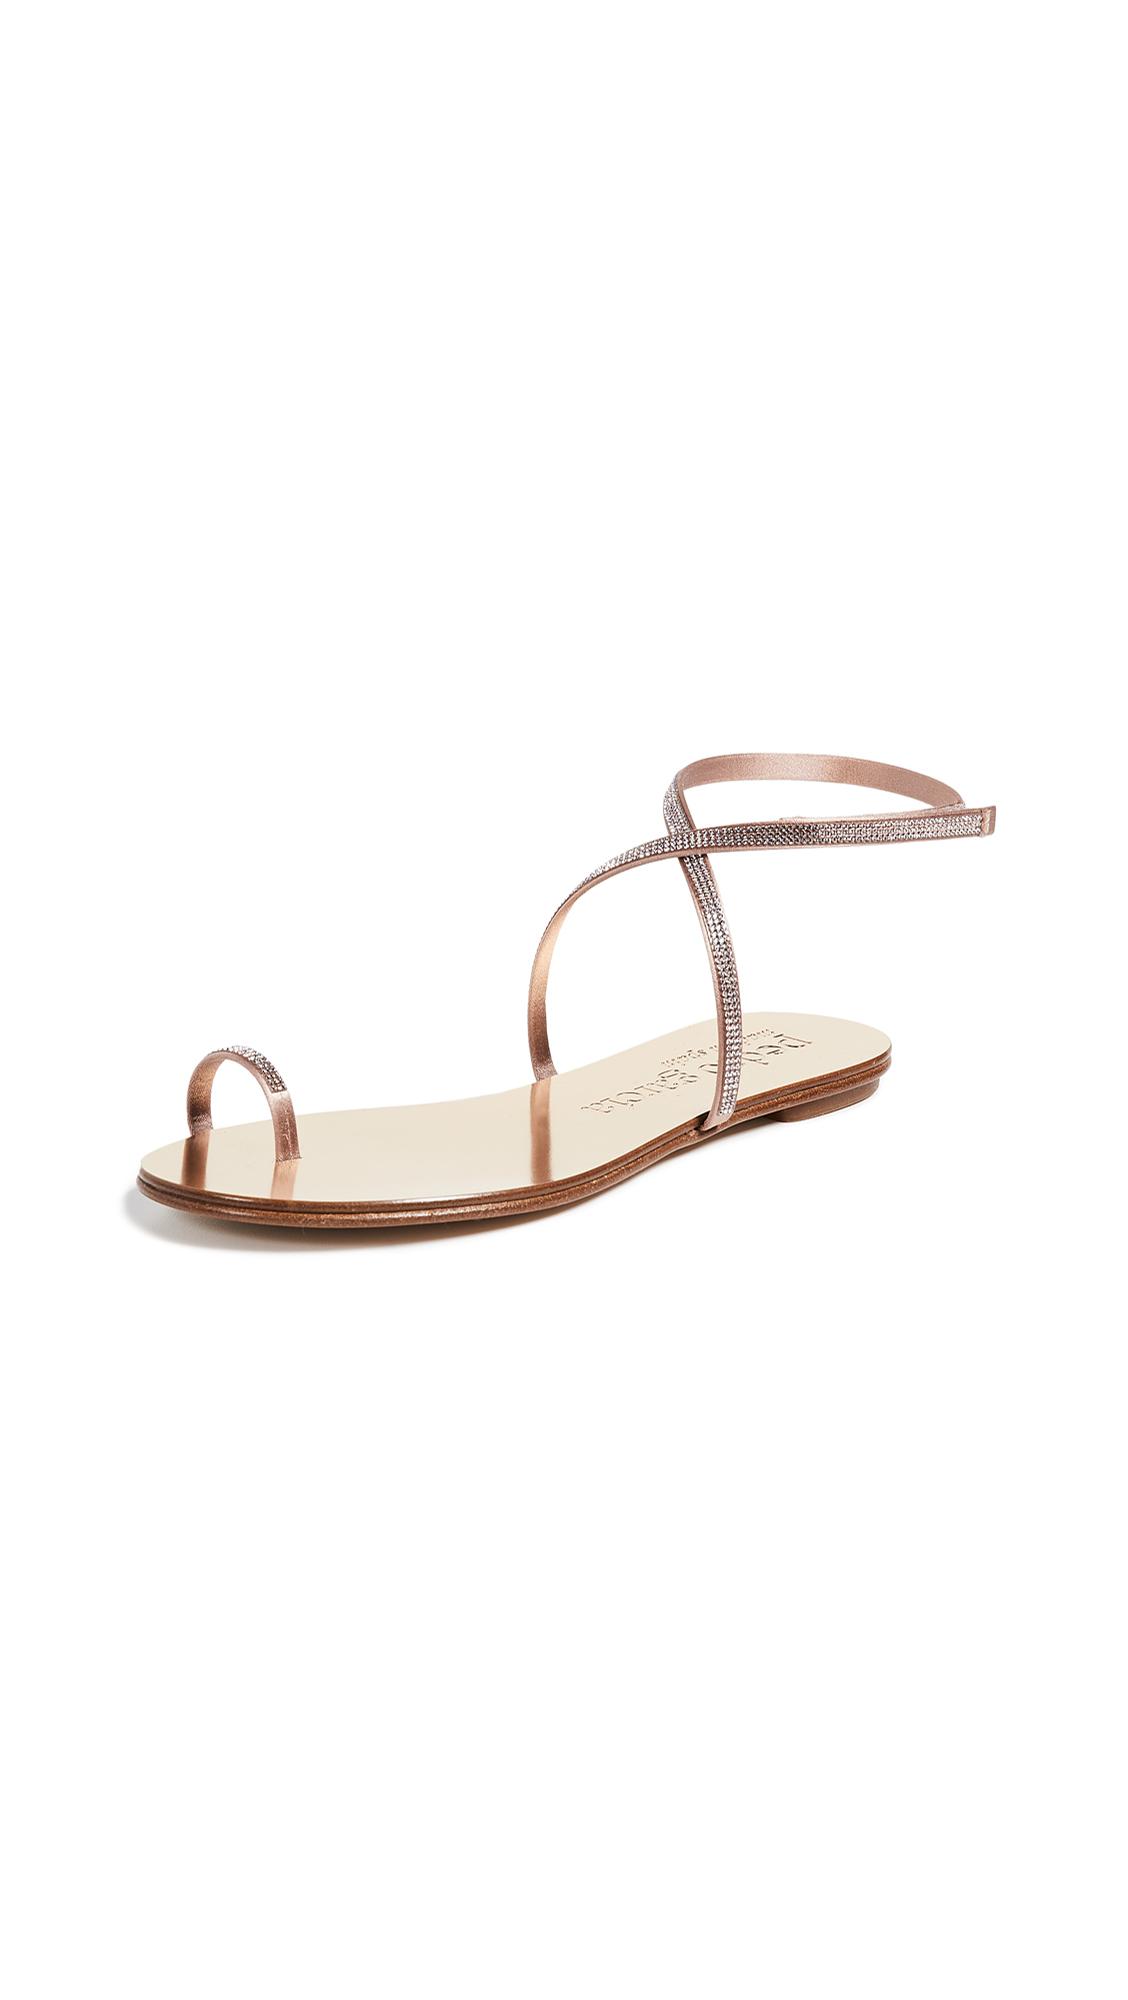 Pedro Garcia Sonay Flat Sandals - Morganite